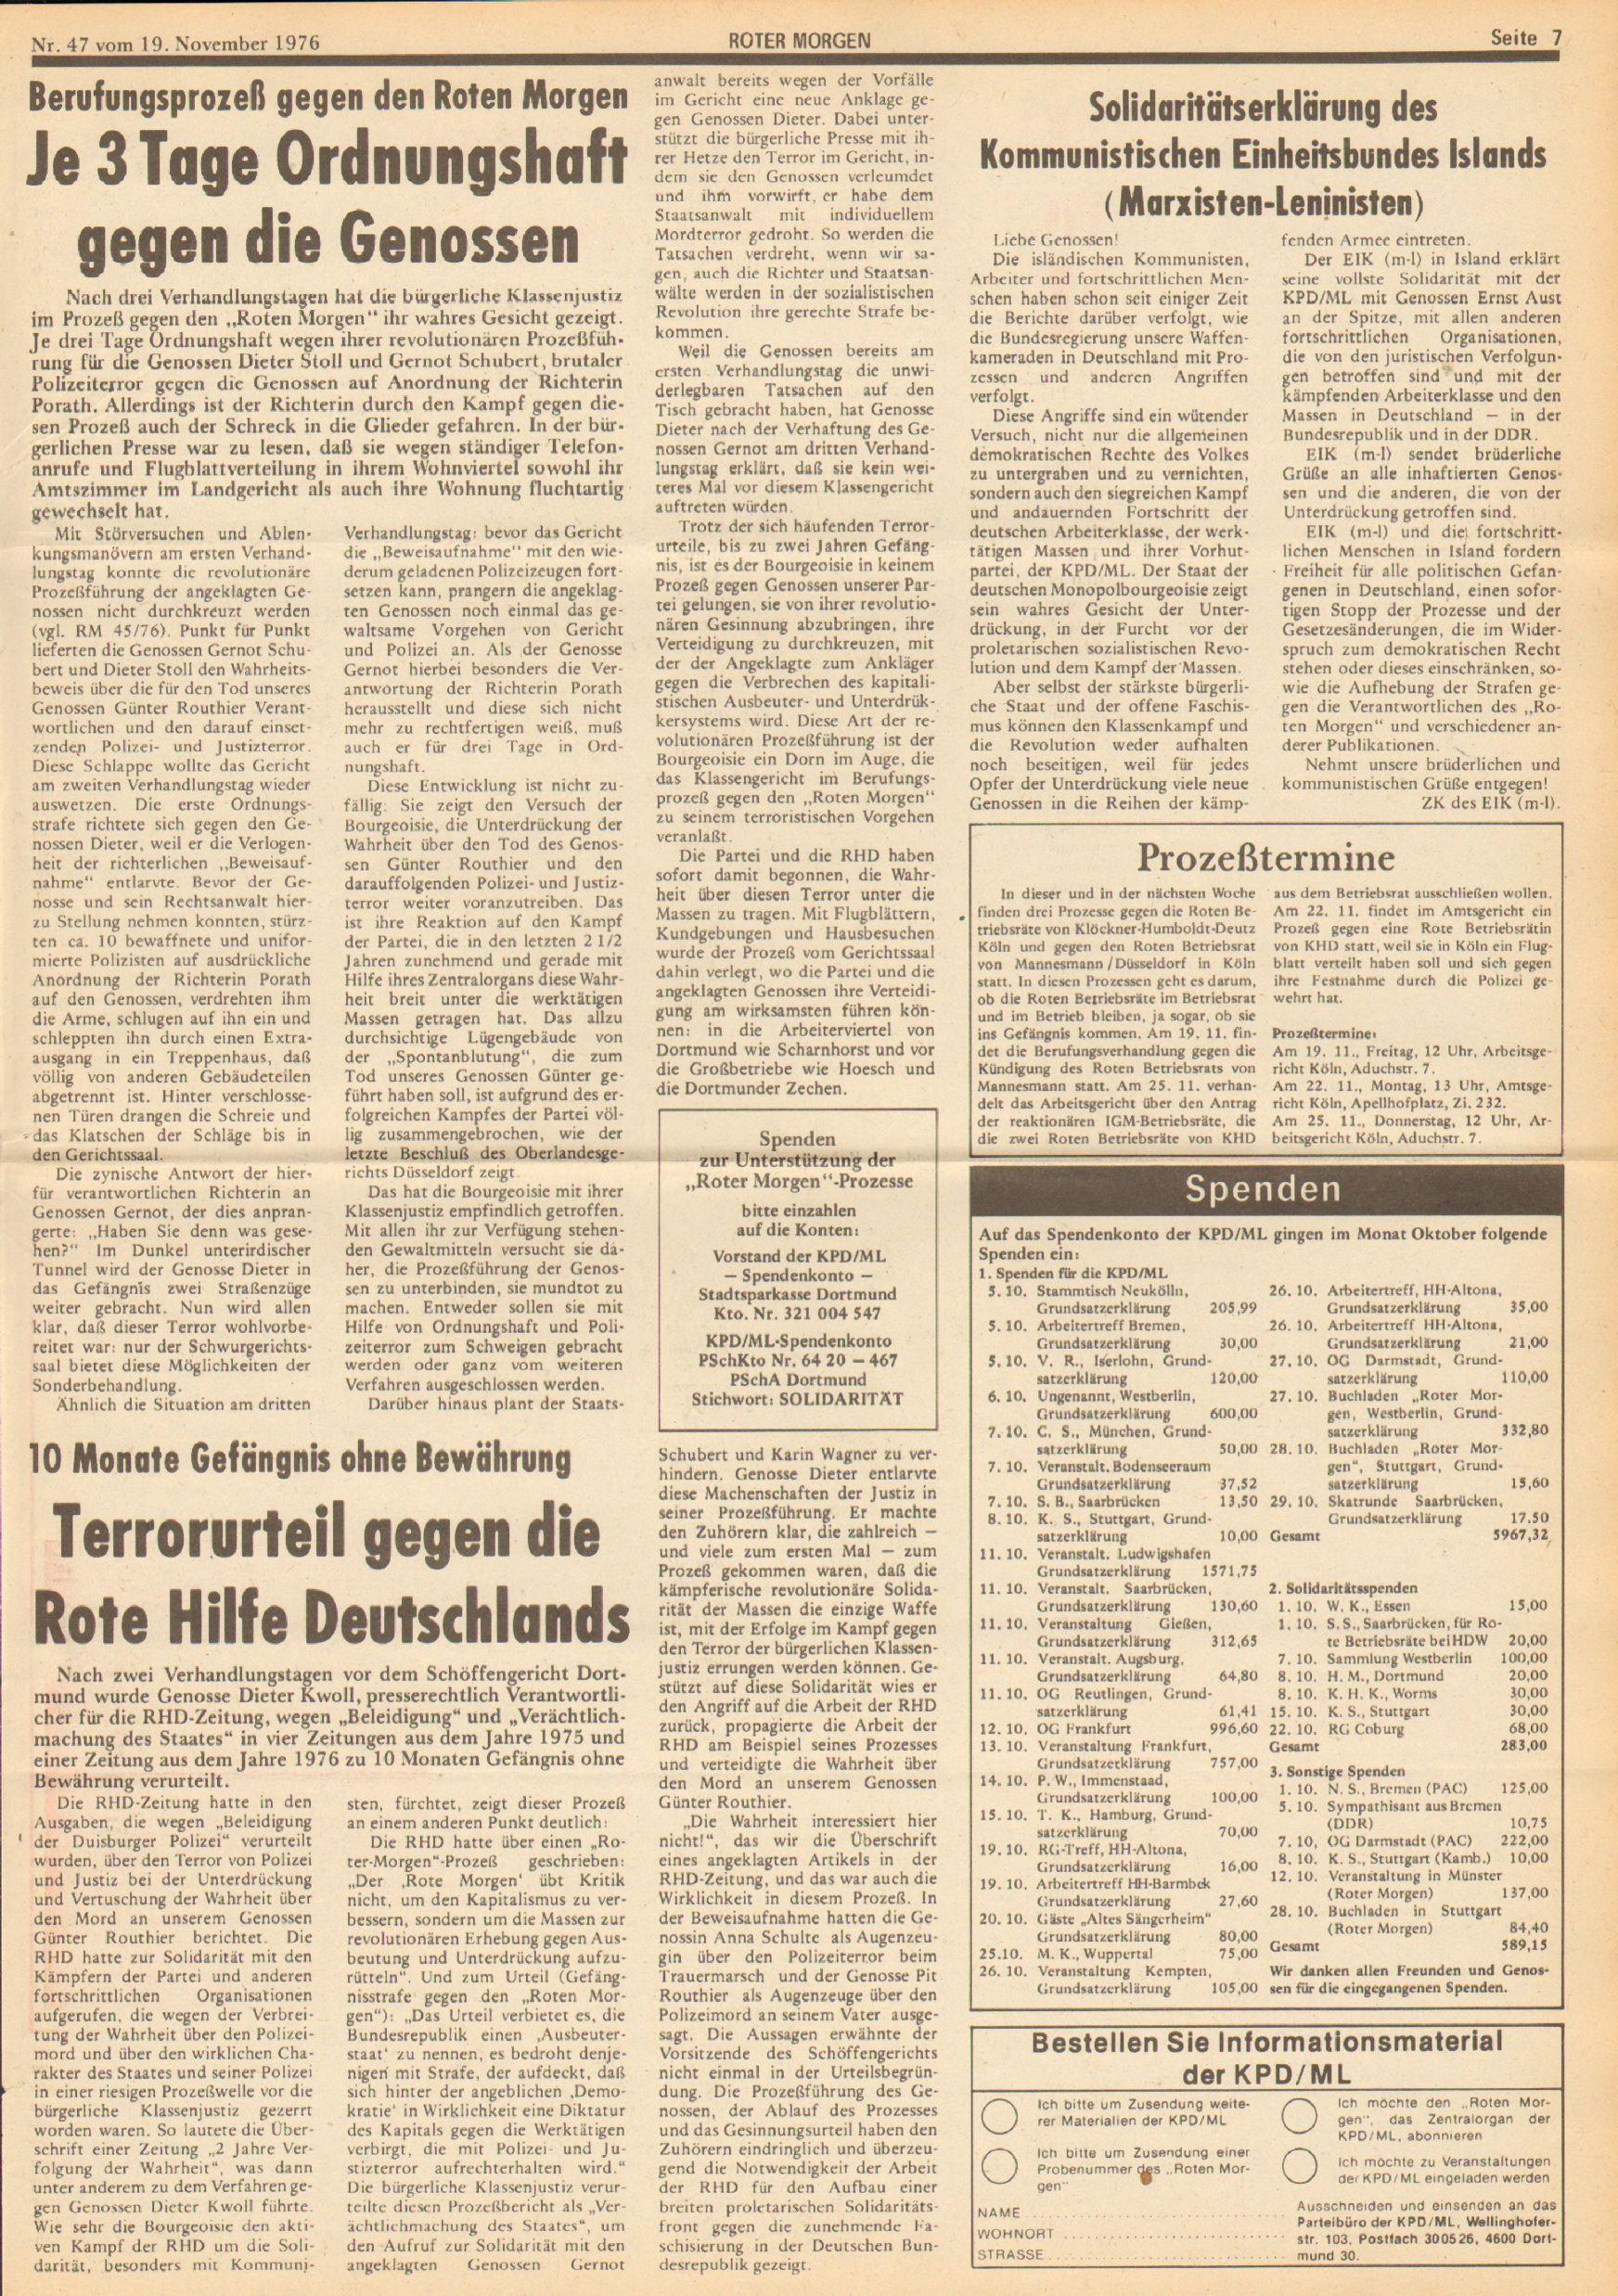 Roter Morgen, 10. Jg., 19. November 1976, Nr. 47, Seite 7